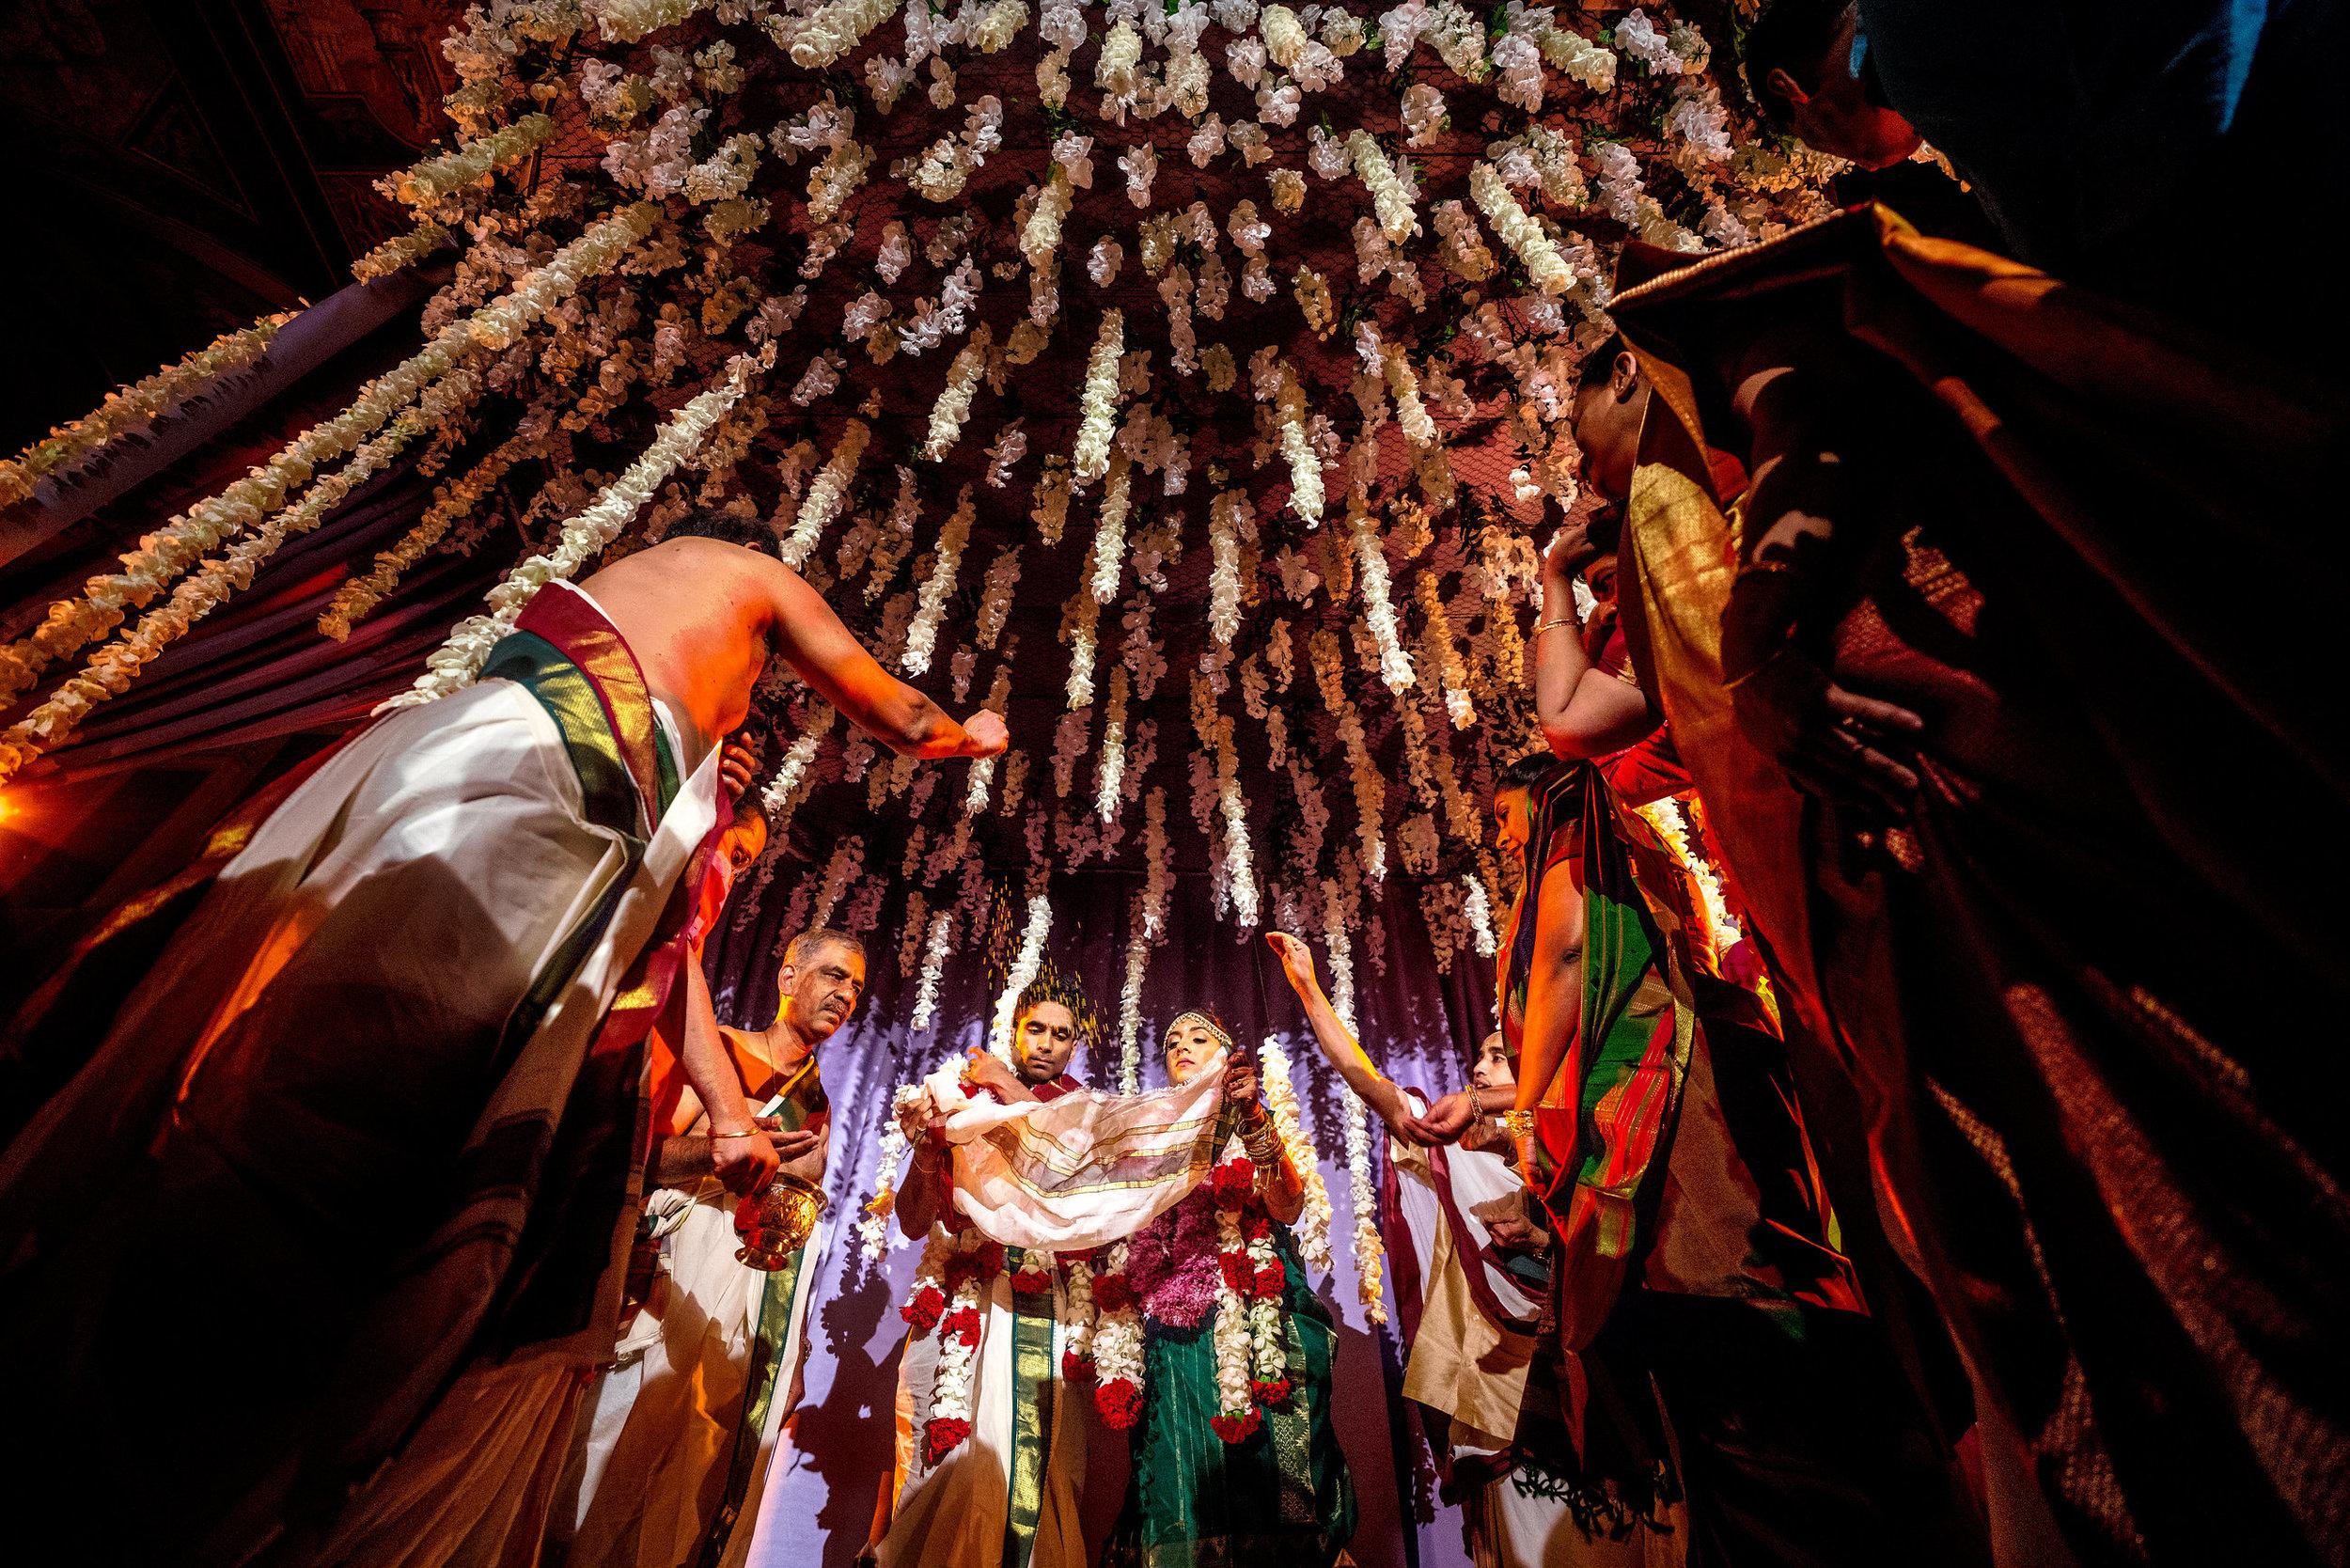 INDIAN WEDDING BRIDE AND GROOM CEREMONY FLOWER ALTER2.JPG